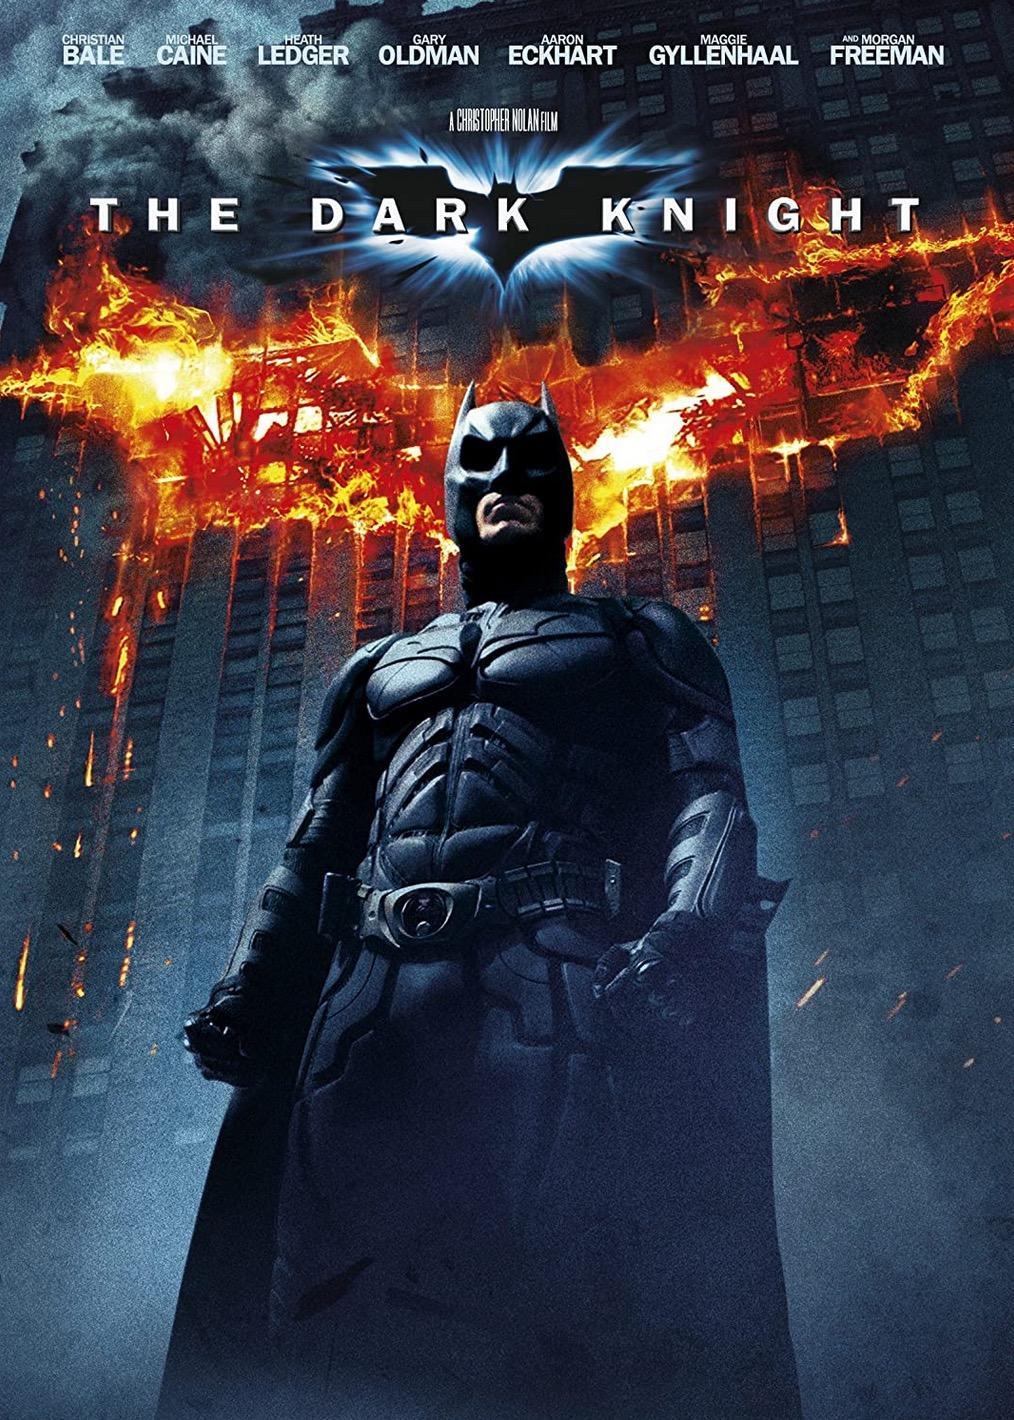 La trilogie Dark Knight - 2005-2012